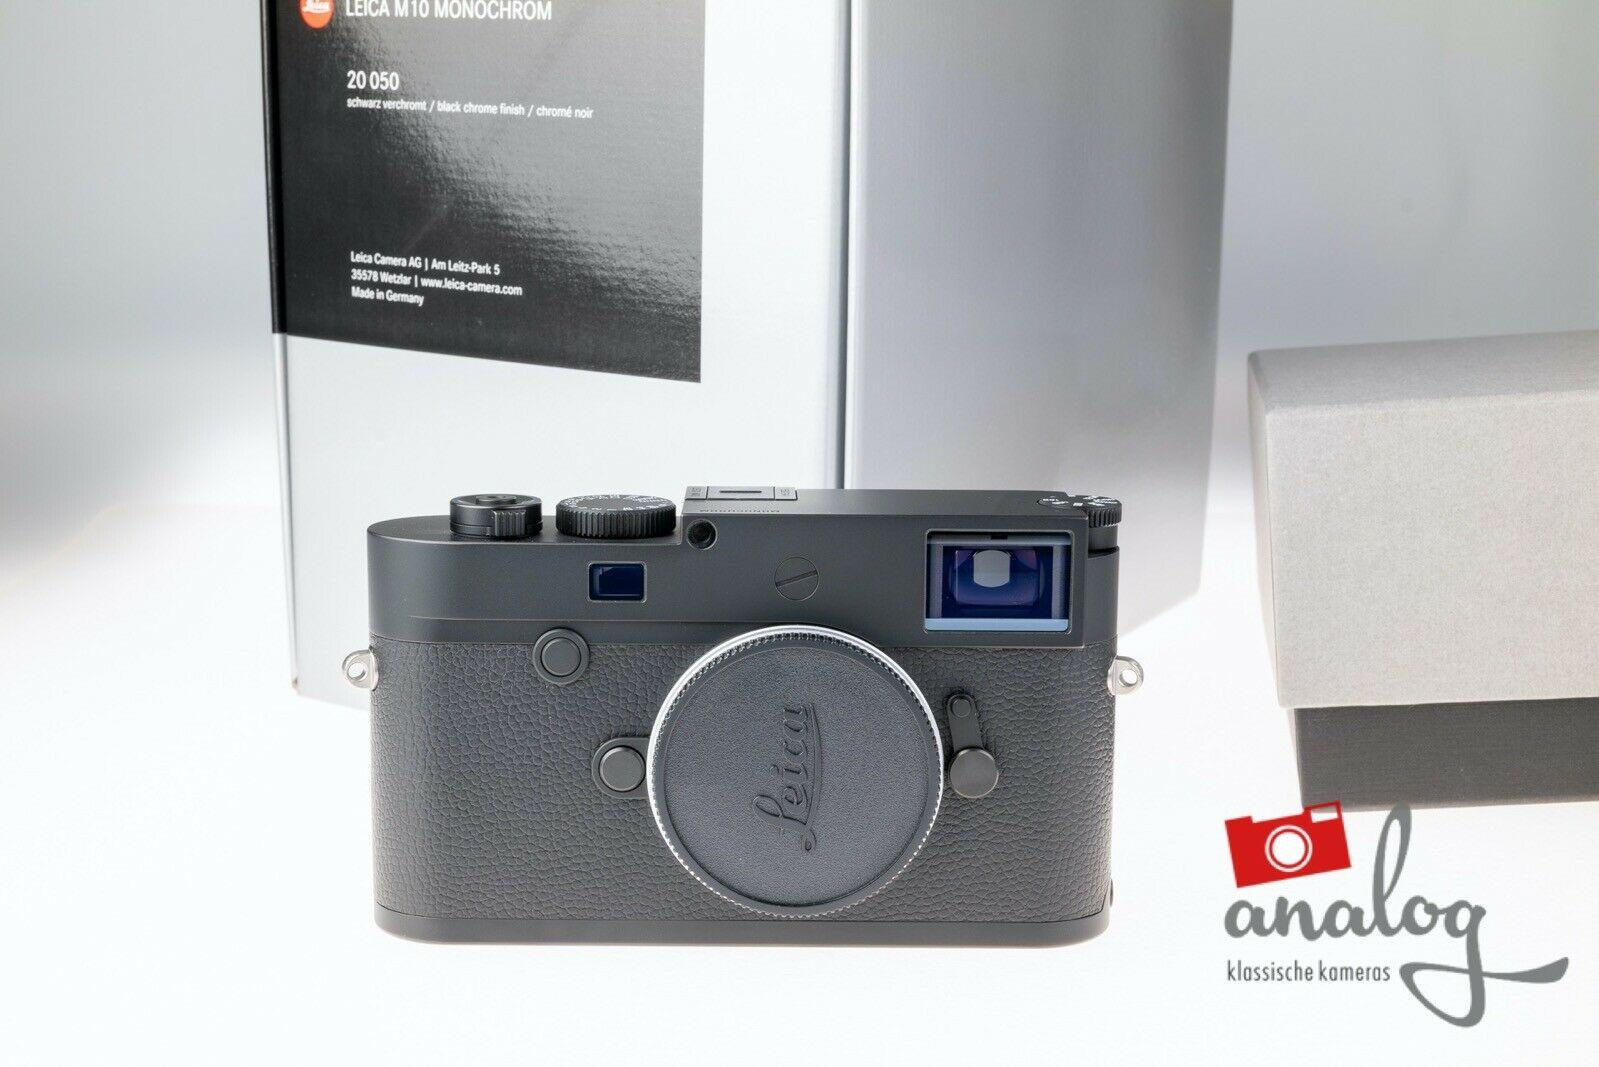 Leica M10 Monochrome - 20050